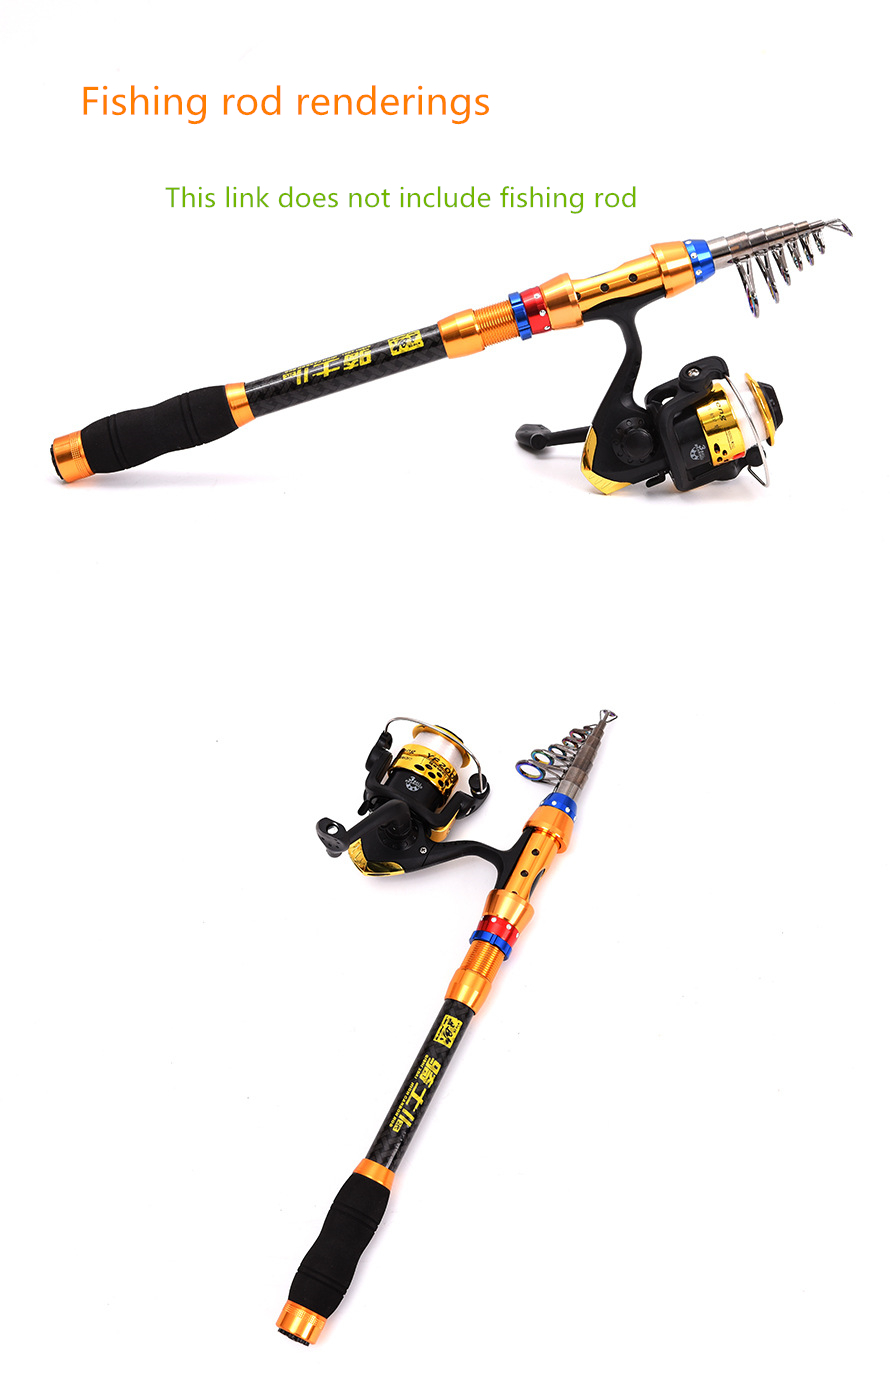 ФОТО 2016 Super hard lightweight carbon 1.8m 2.1m 2.4m 2.7m 3.0m 3.6m telescopic fishing rods sea rockies pole fishing tackle 1606185